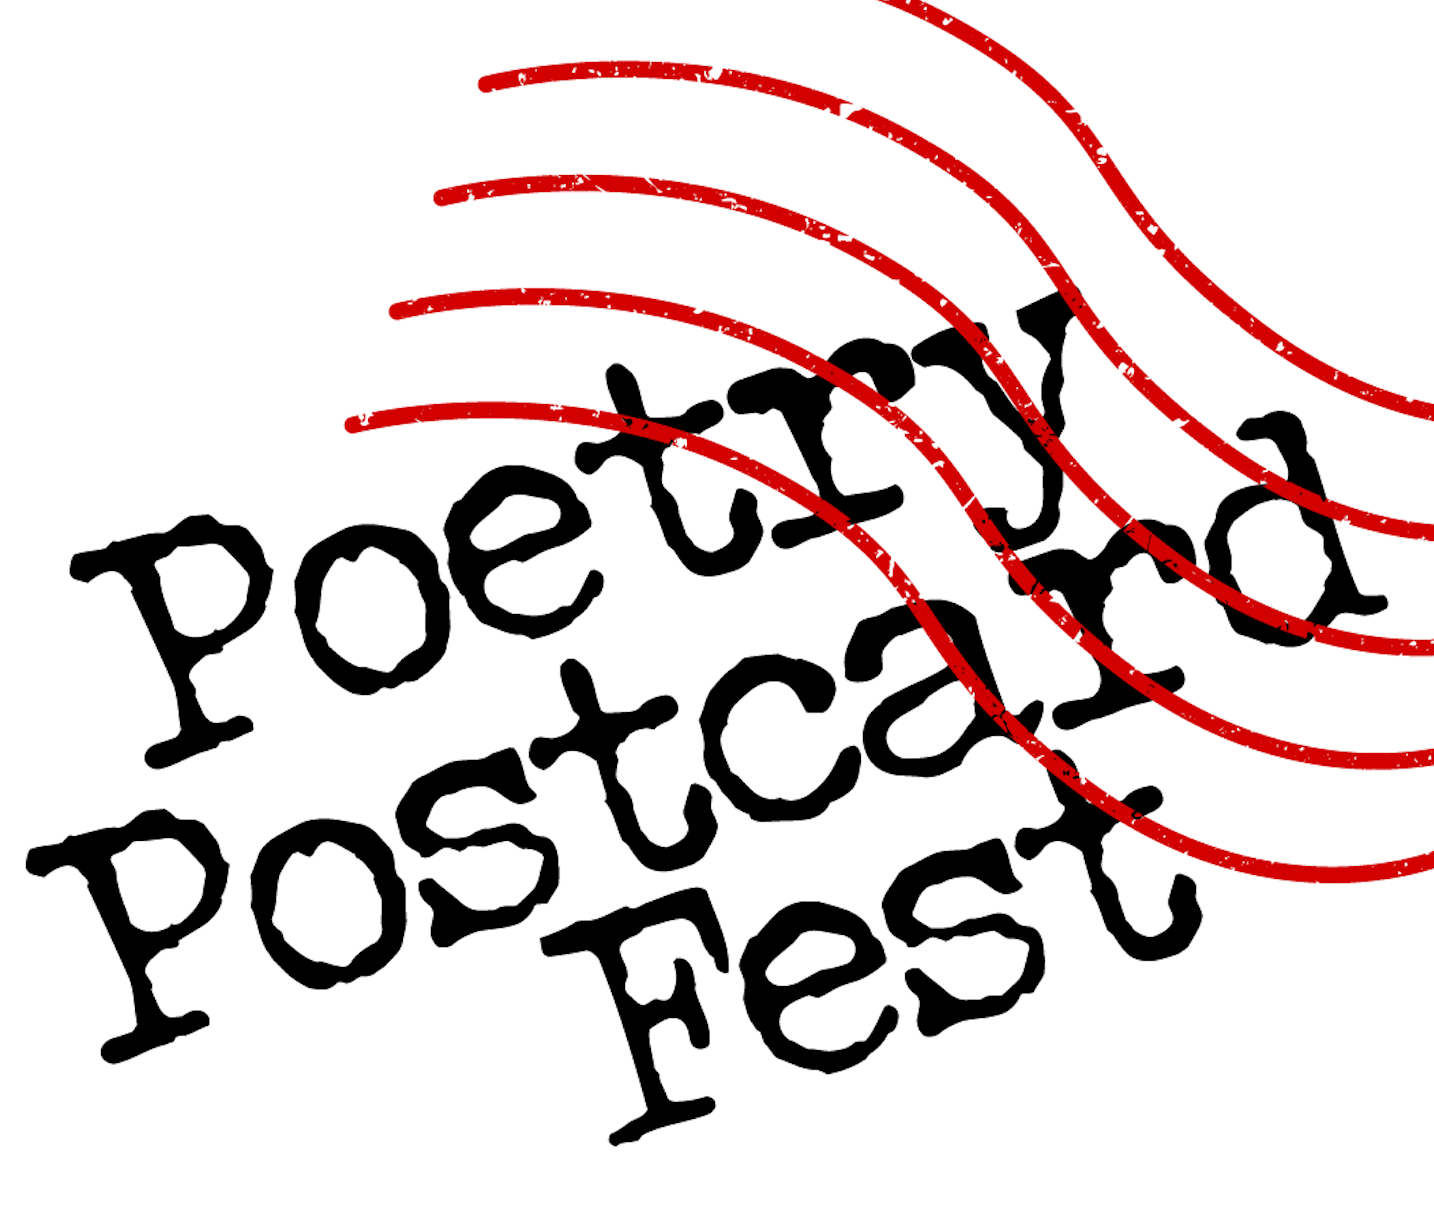 Poetry Postcard Orientation